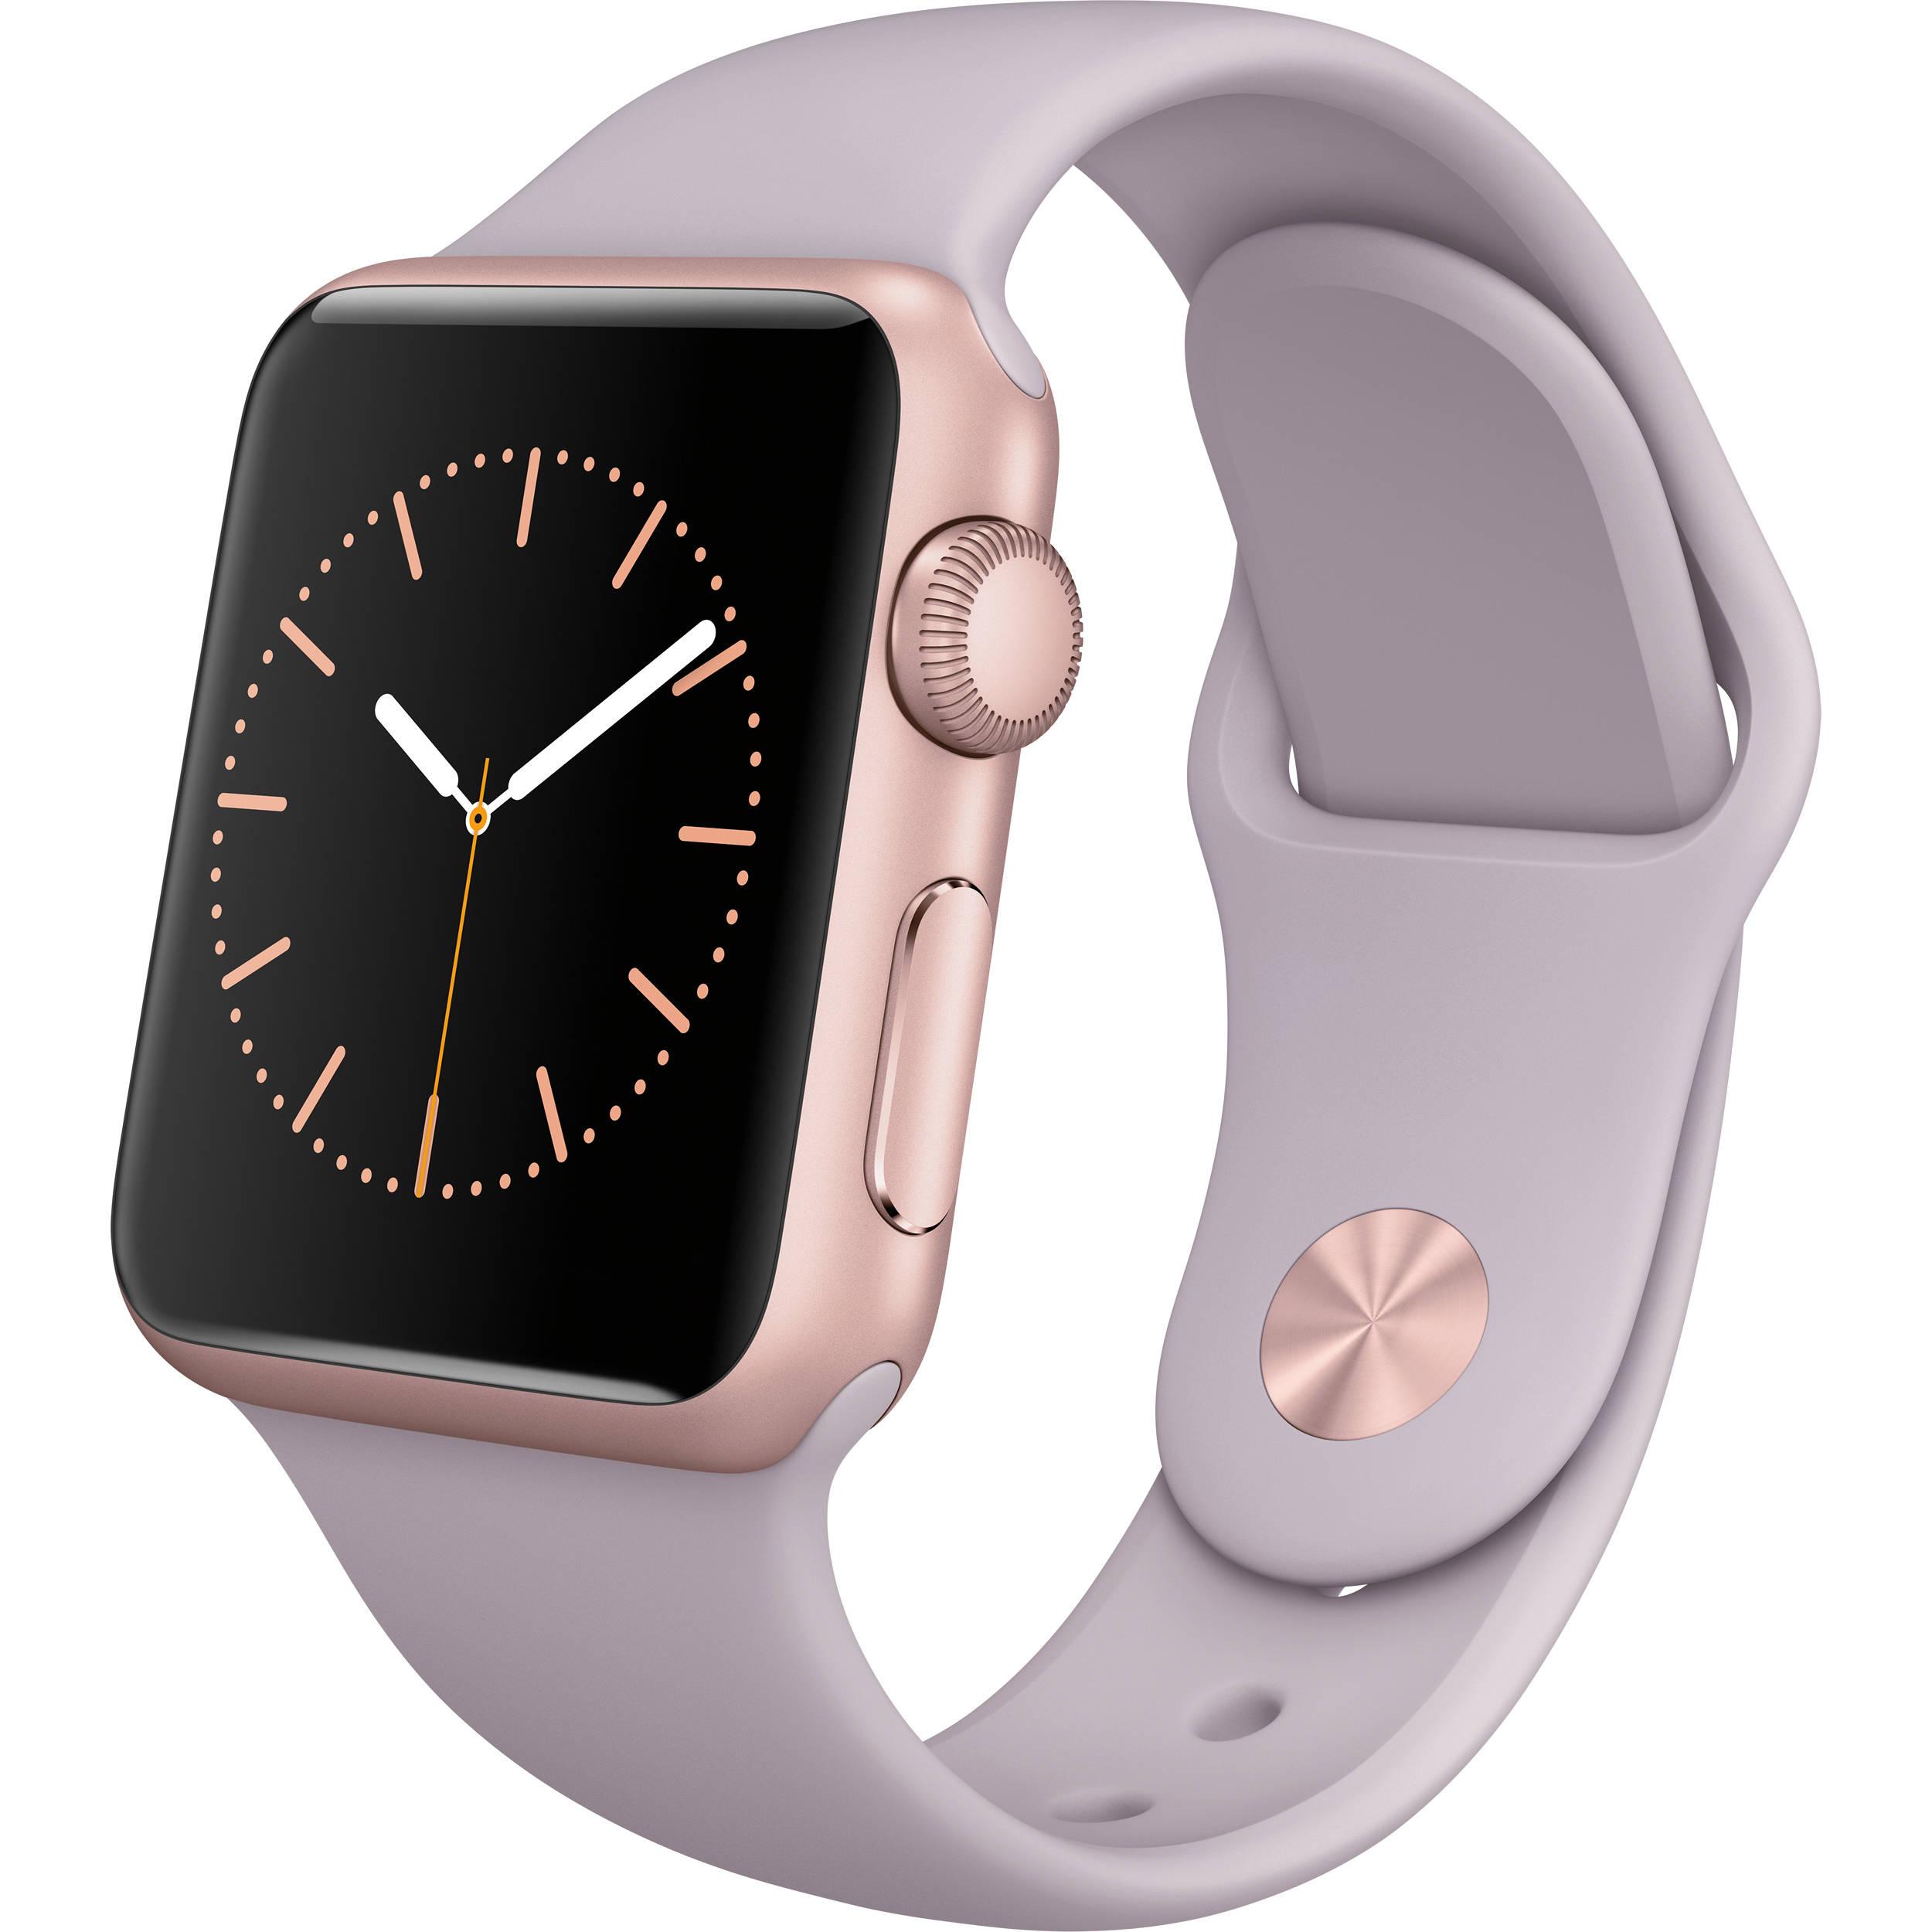 Apple Watch Sport 38mm Smartwatch MLCH2LLA BampH Photo Video